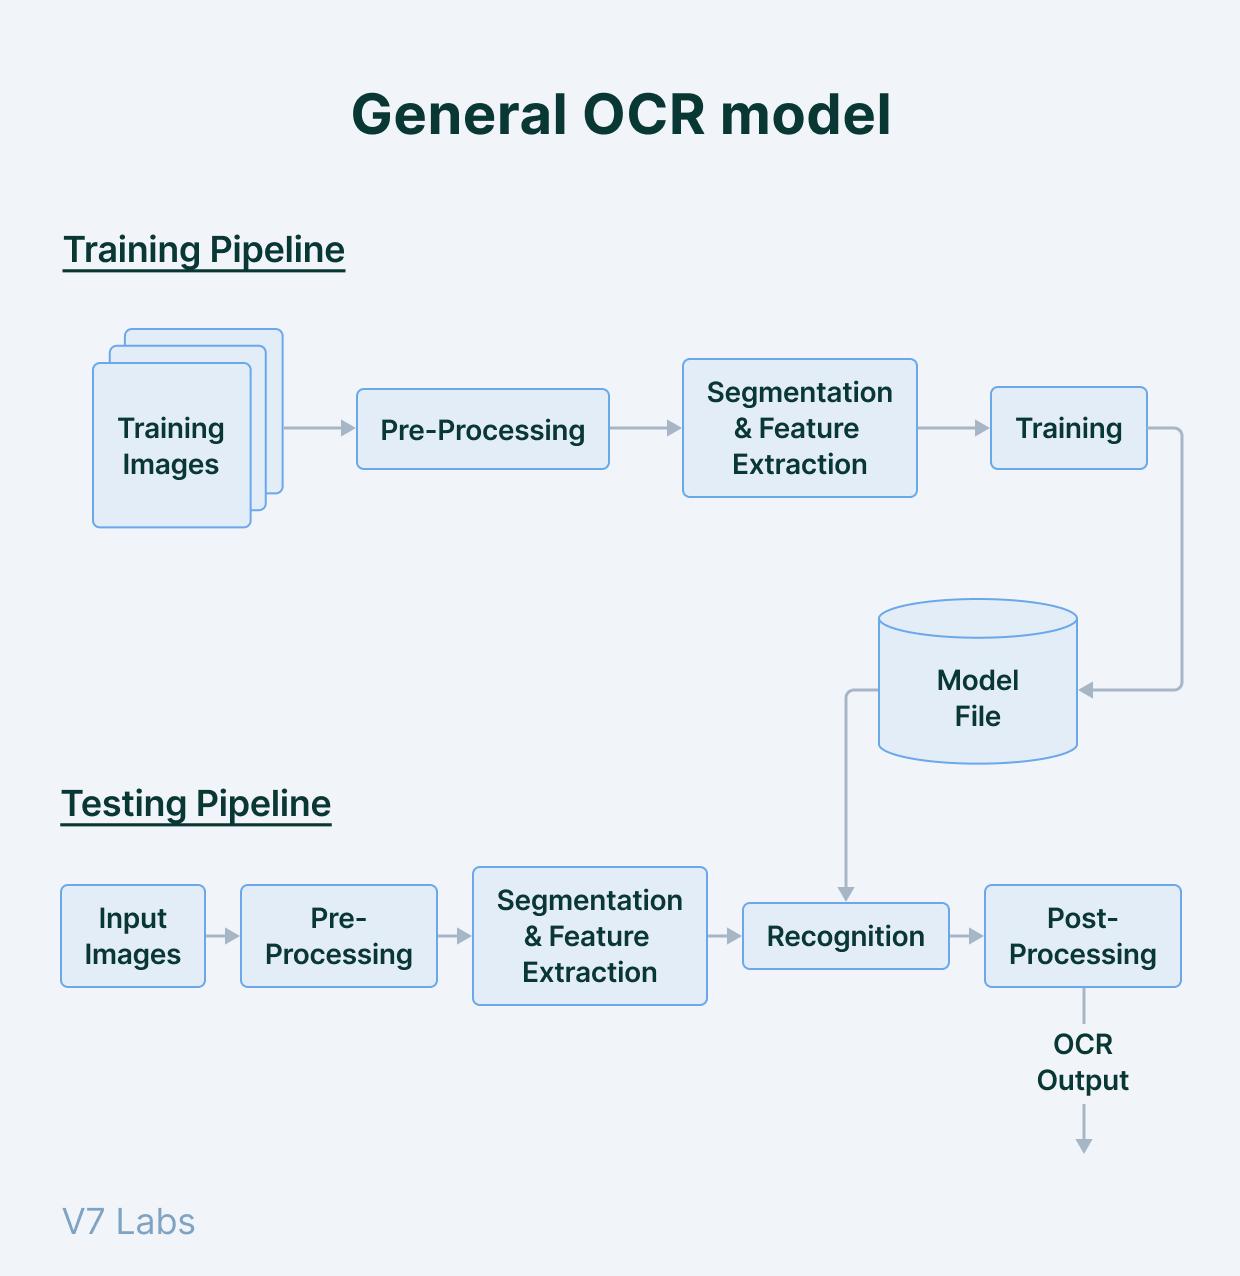 Tradicional OCR model overview